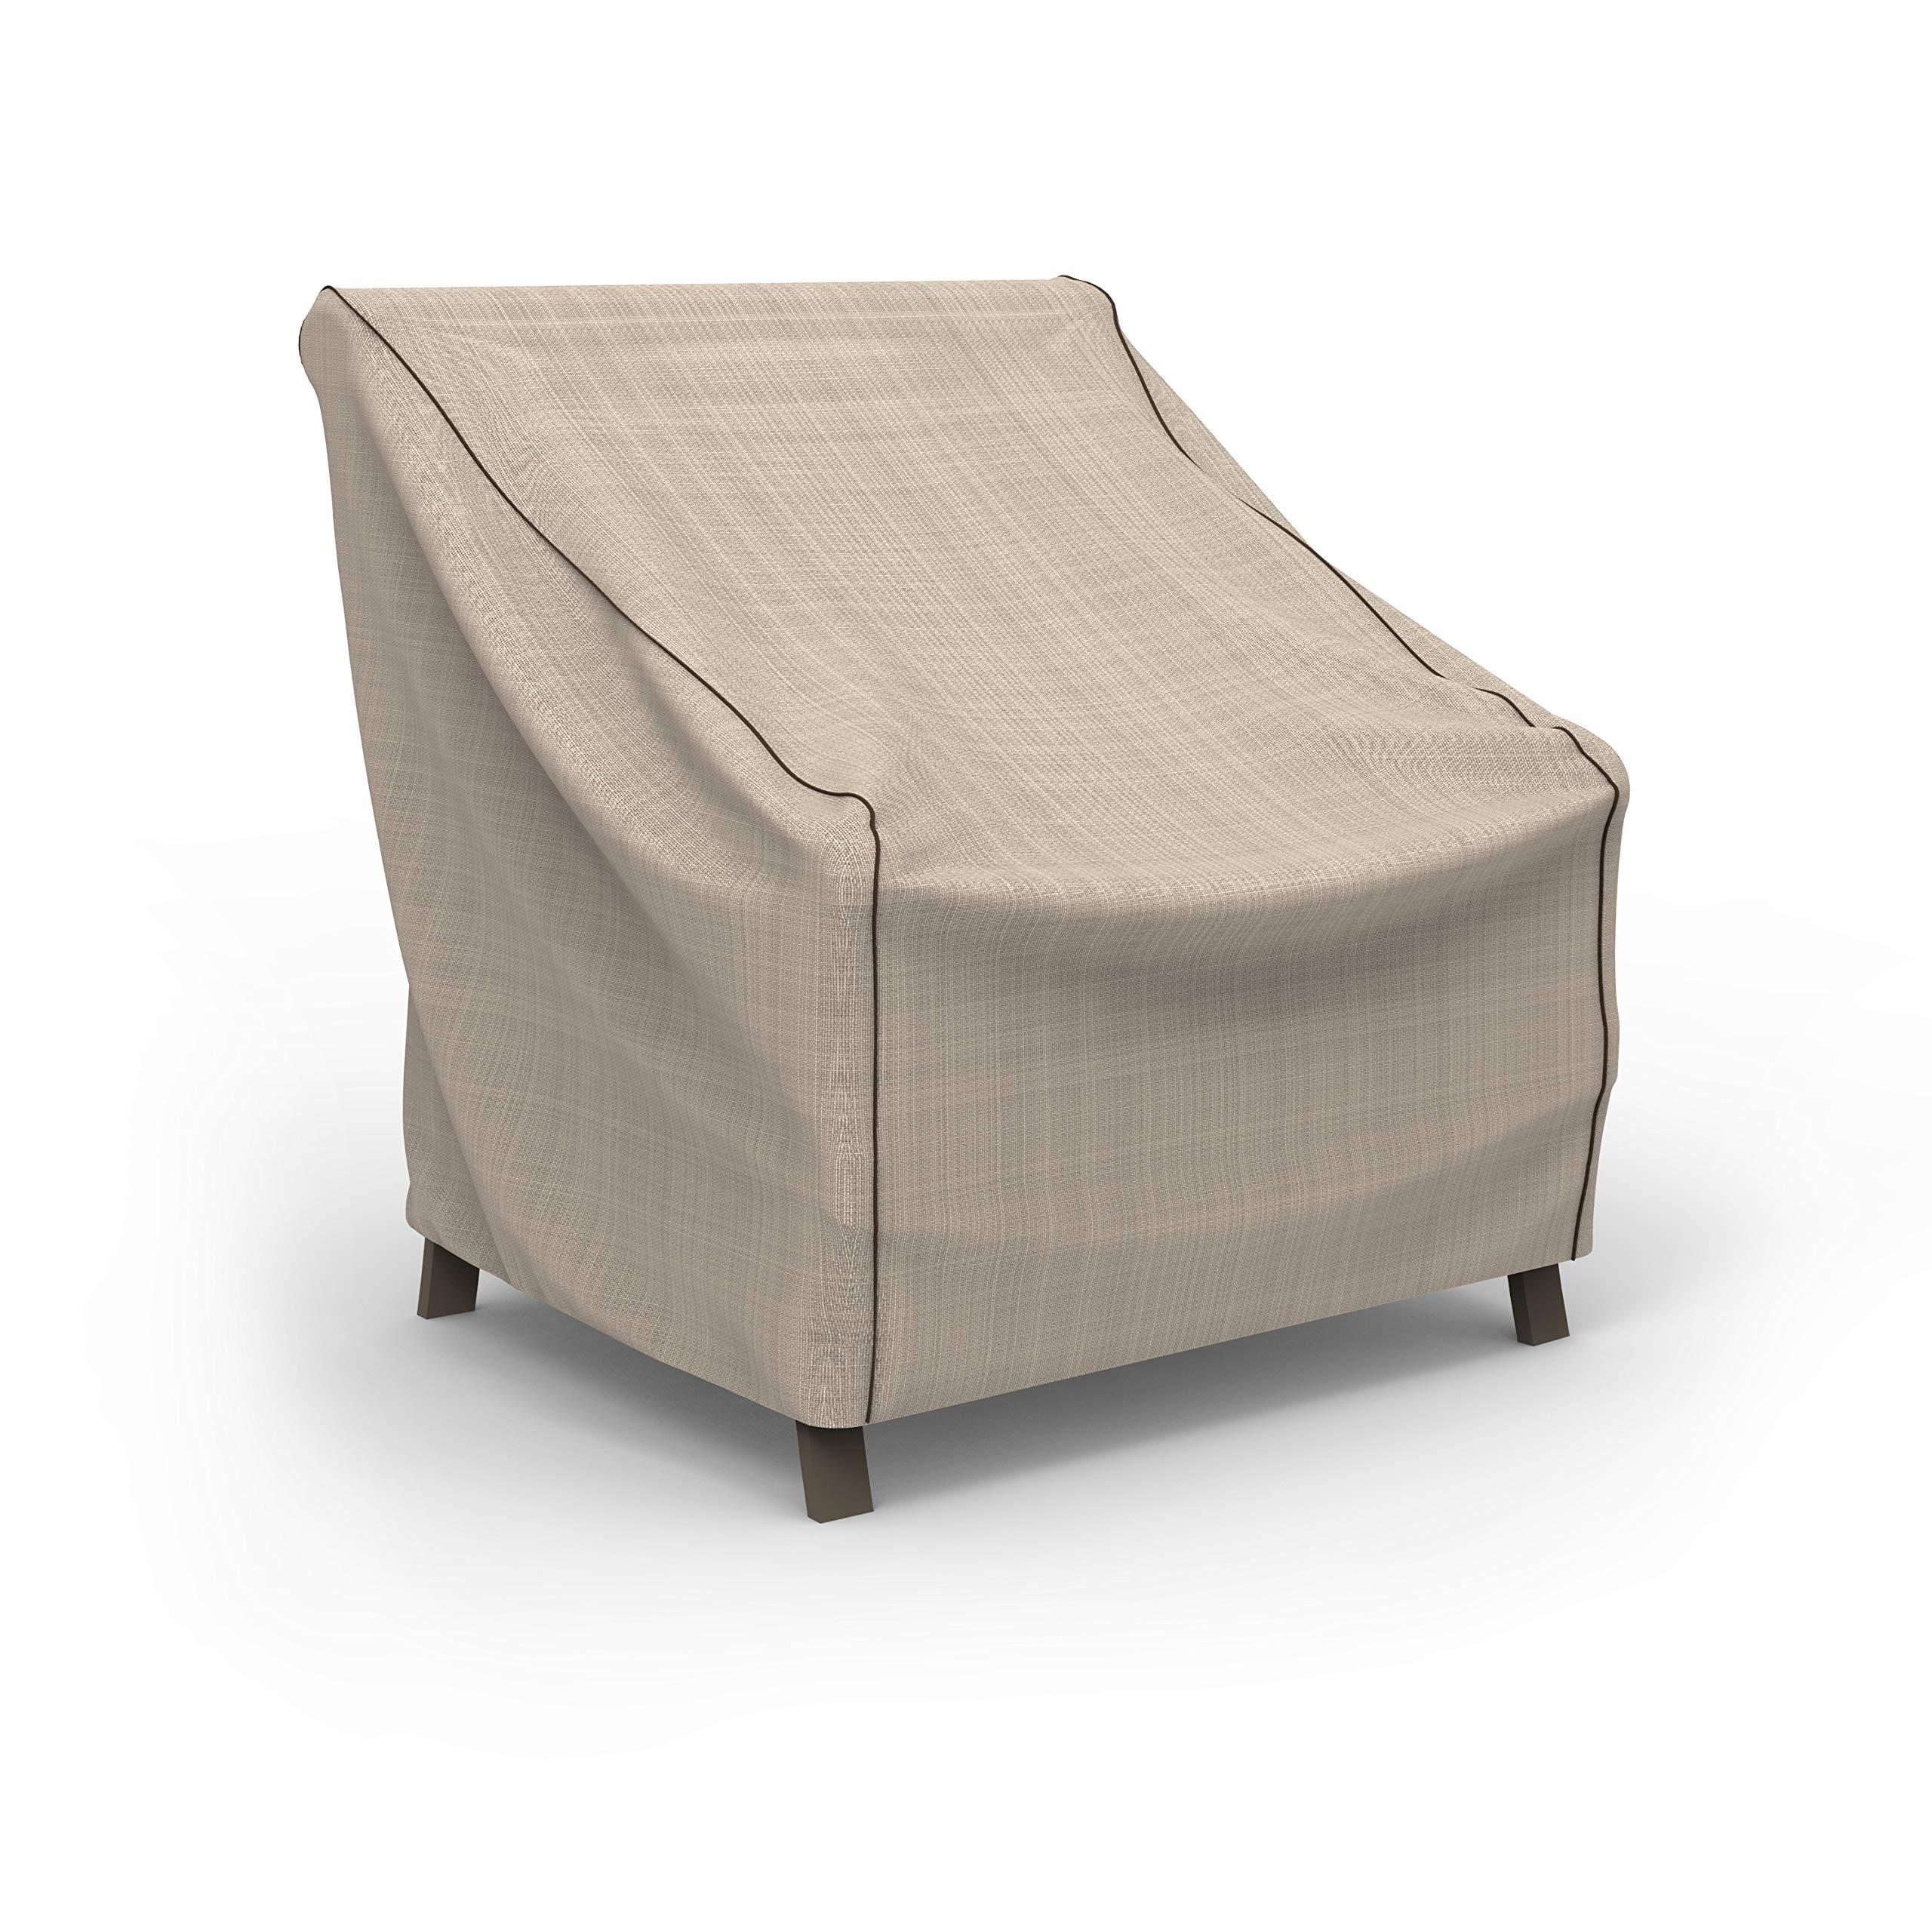 EmpirePatio Tan Tweed Patio Chair Cover, Medium